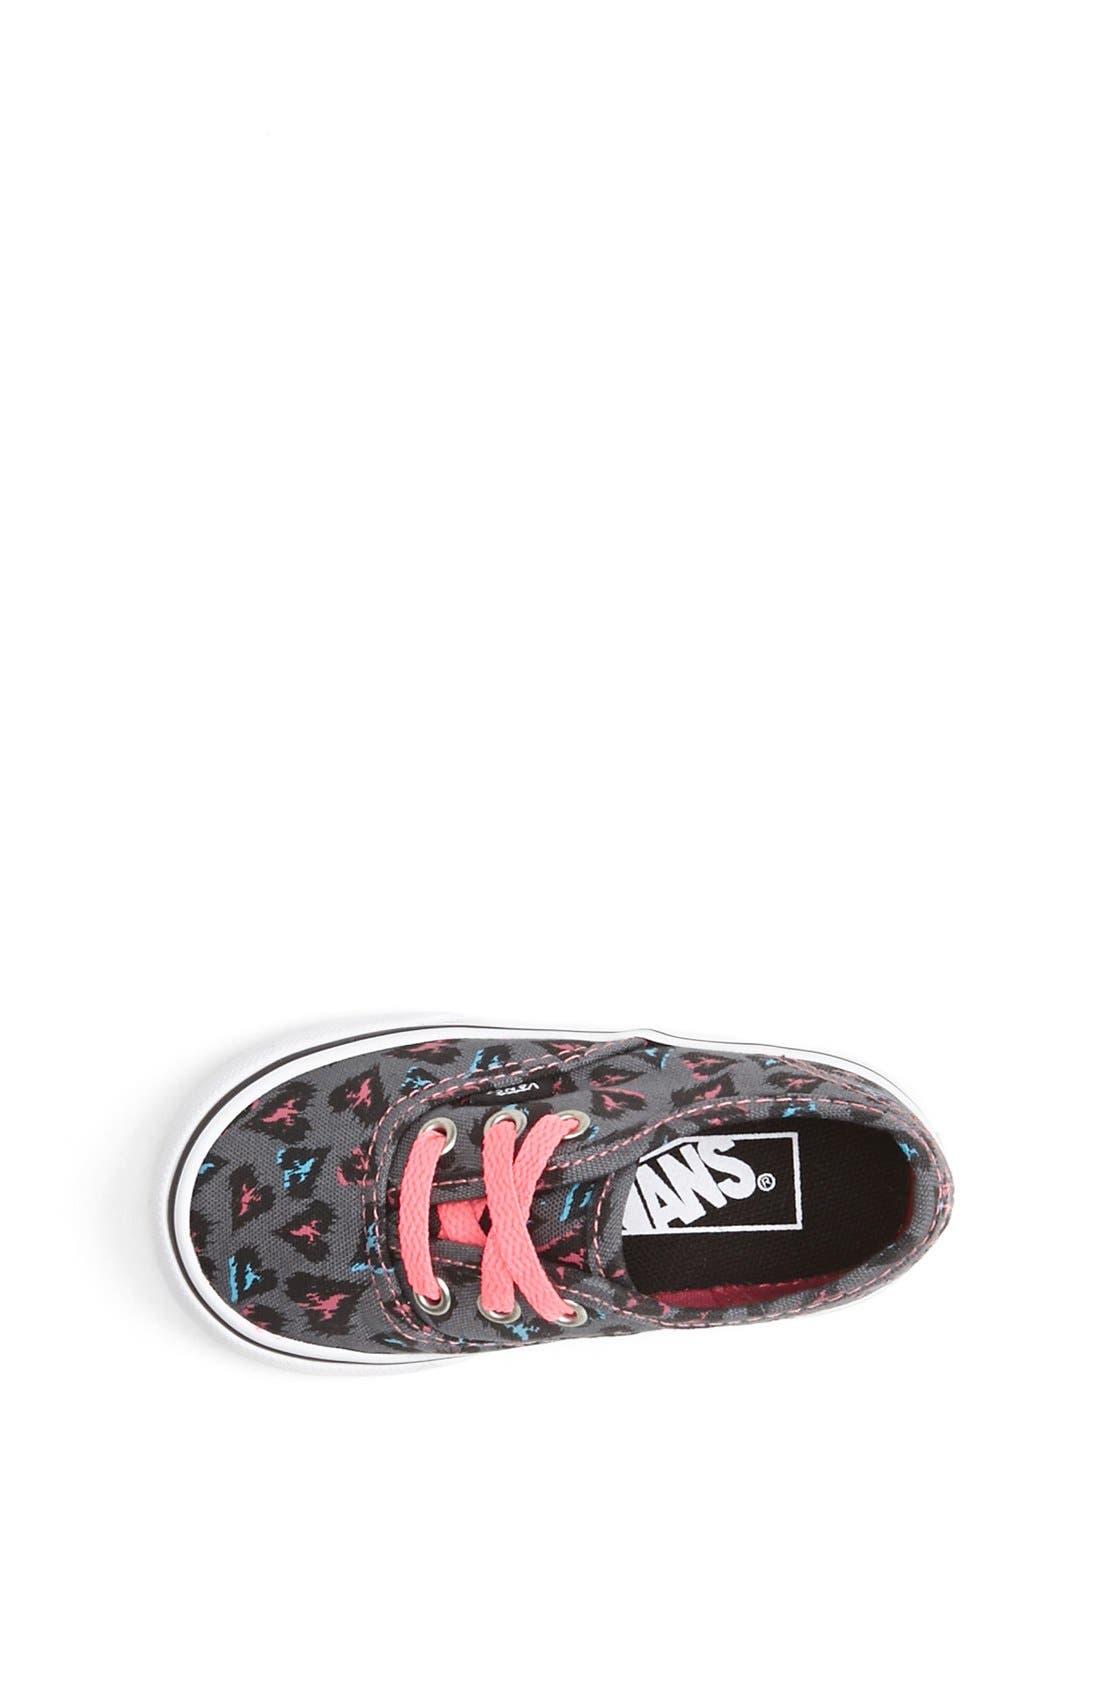 Alternate Image 3  - Vans 'Authentic - Heart Leopard Print' Sneaker (Baby, Walker & Toddler)